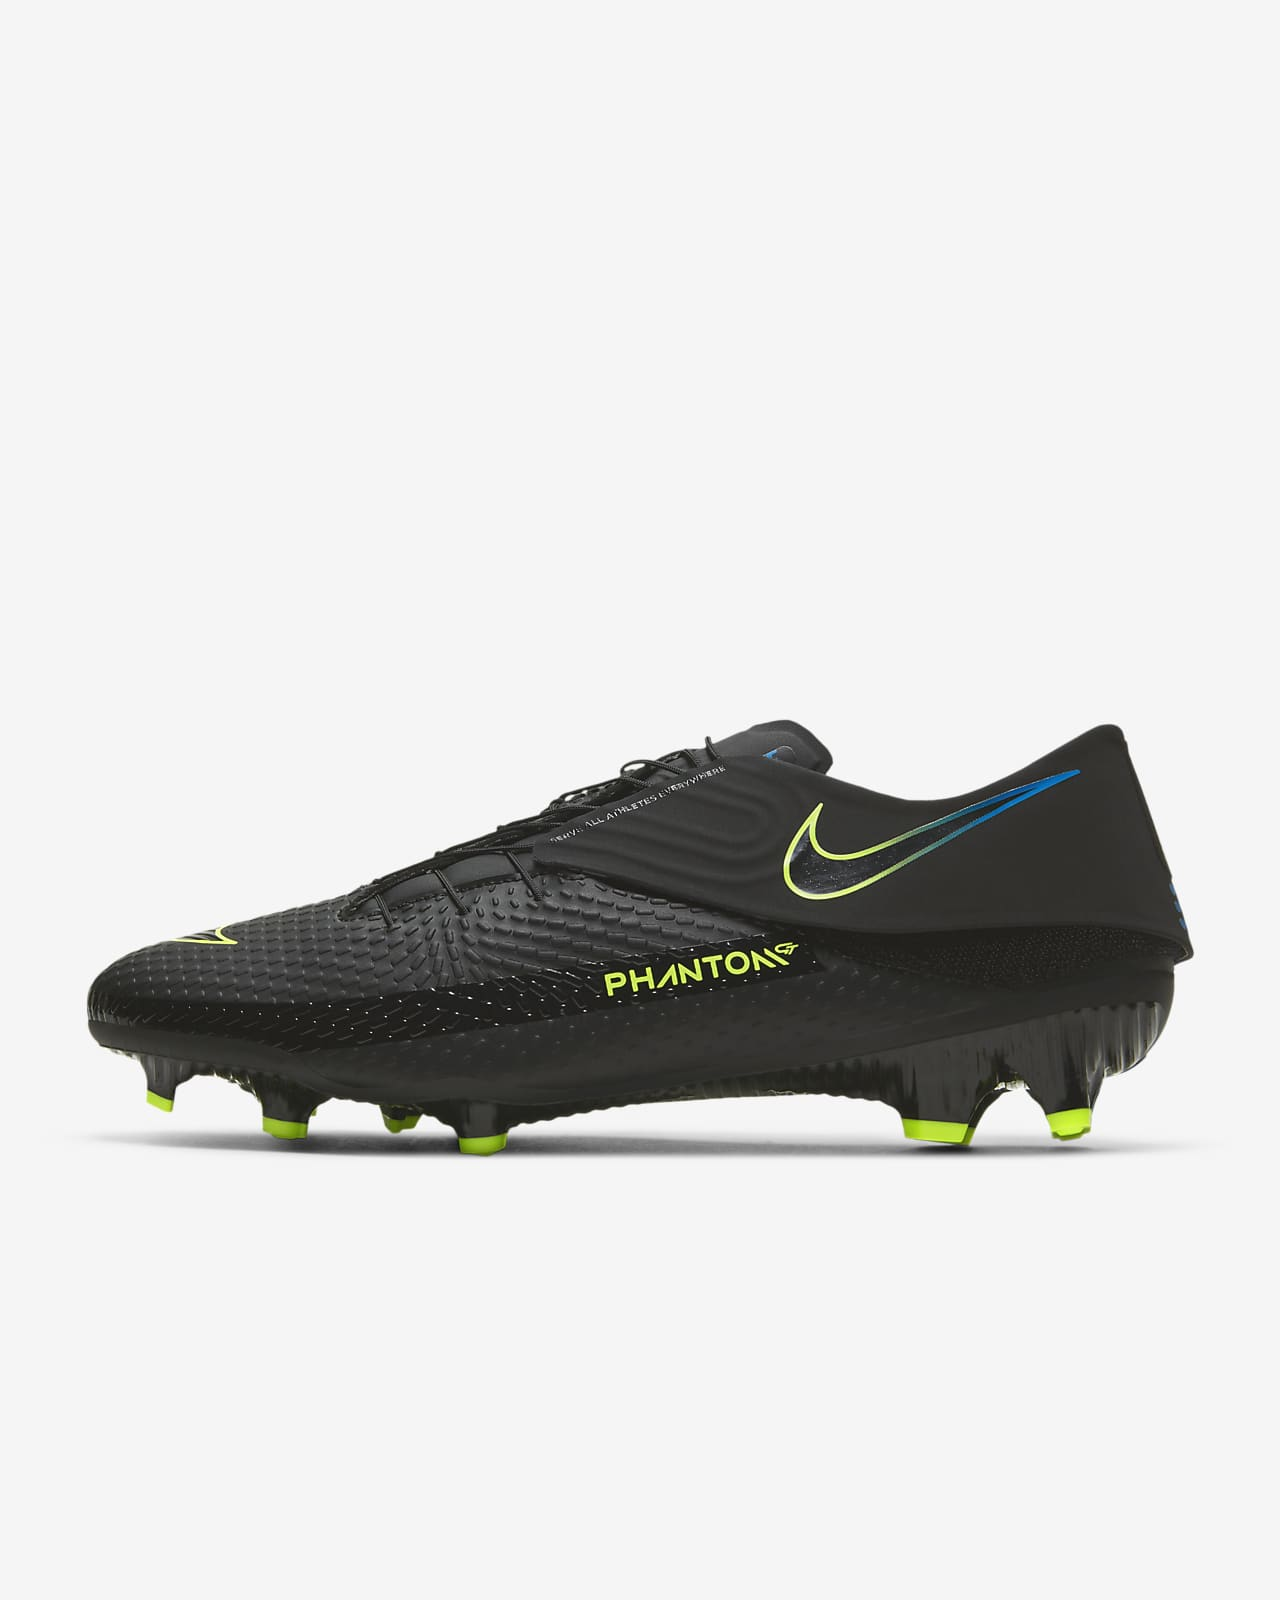 Chaussure de football multi-surfaces à crampons Nike Phantom GT Academy FlyEase MG